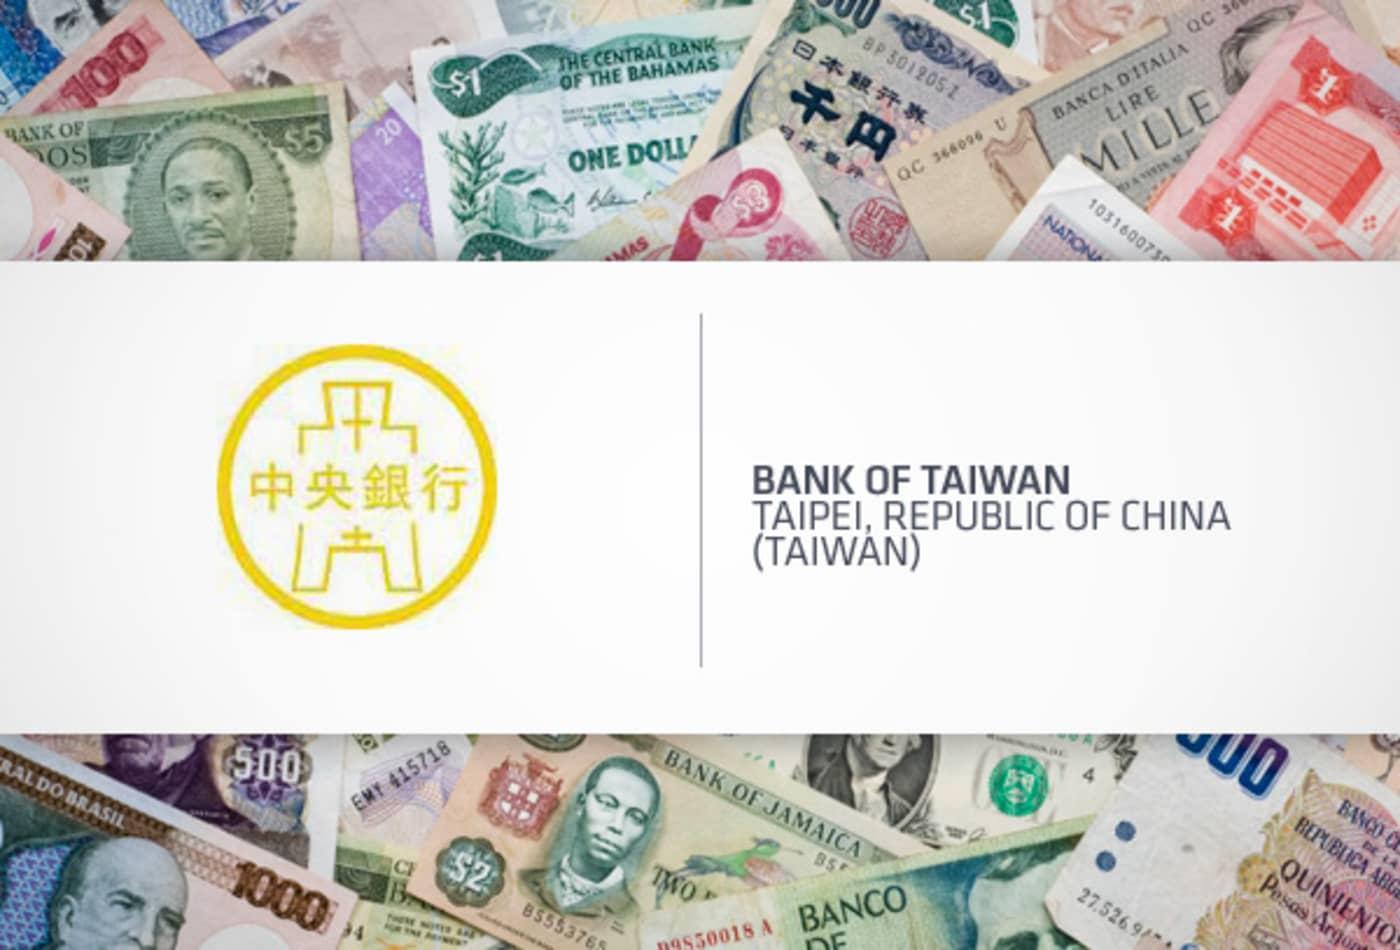 48679701 SS-Safest-Banks-bank-of-taiwan1-12.jpg